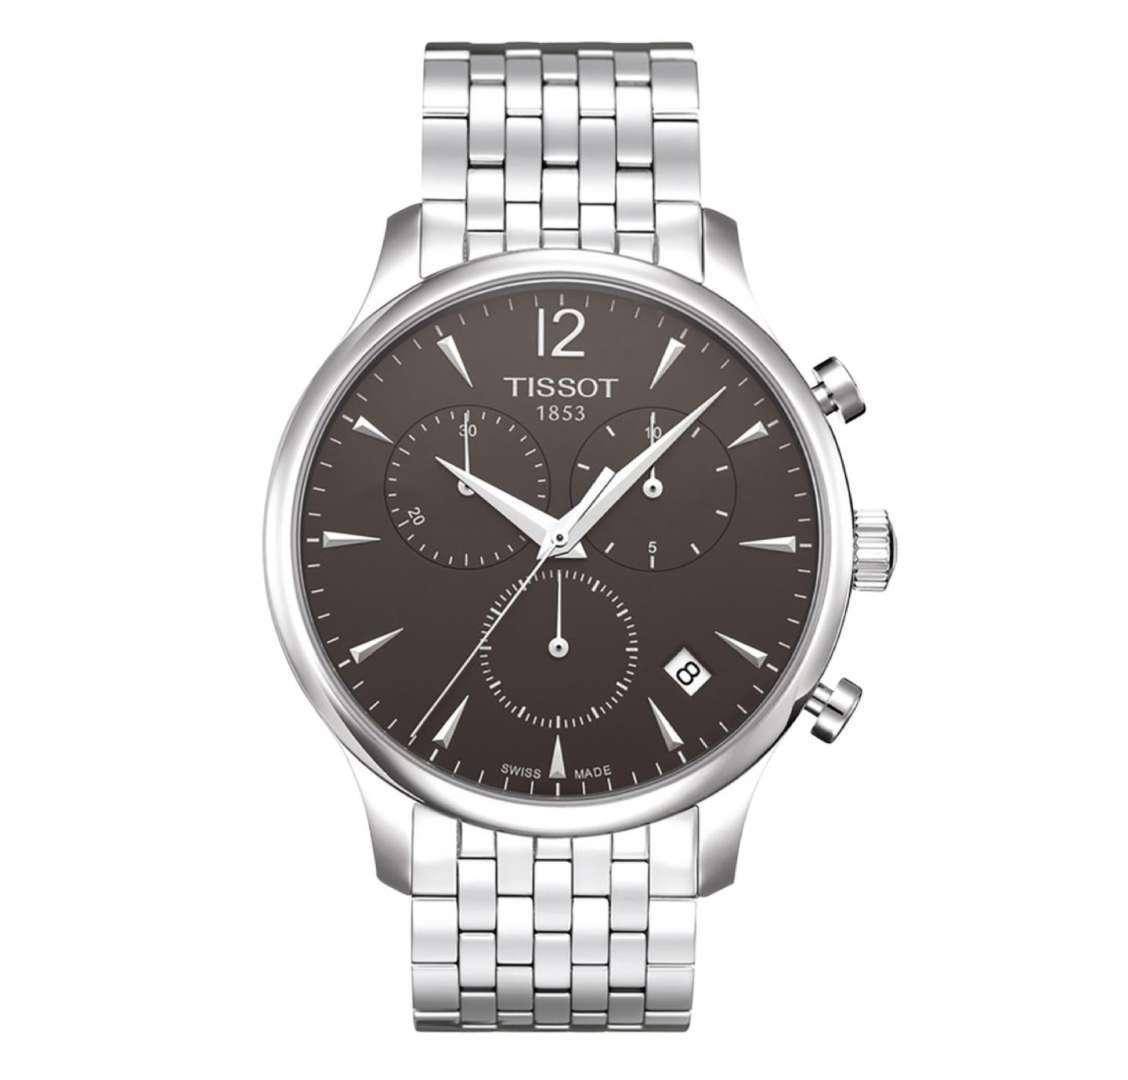 שעון יד אנלוגי tissot t063.617.11.057.00 טיסו